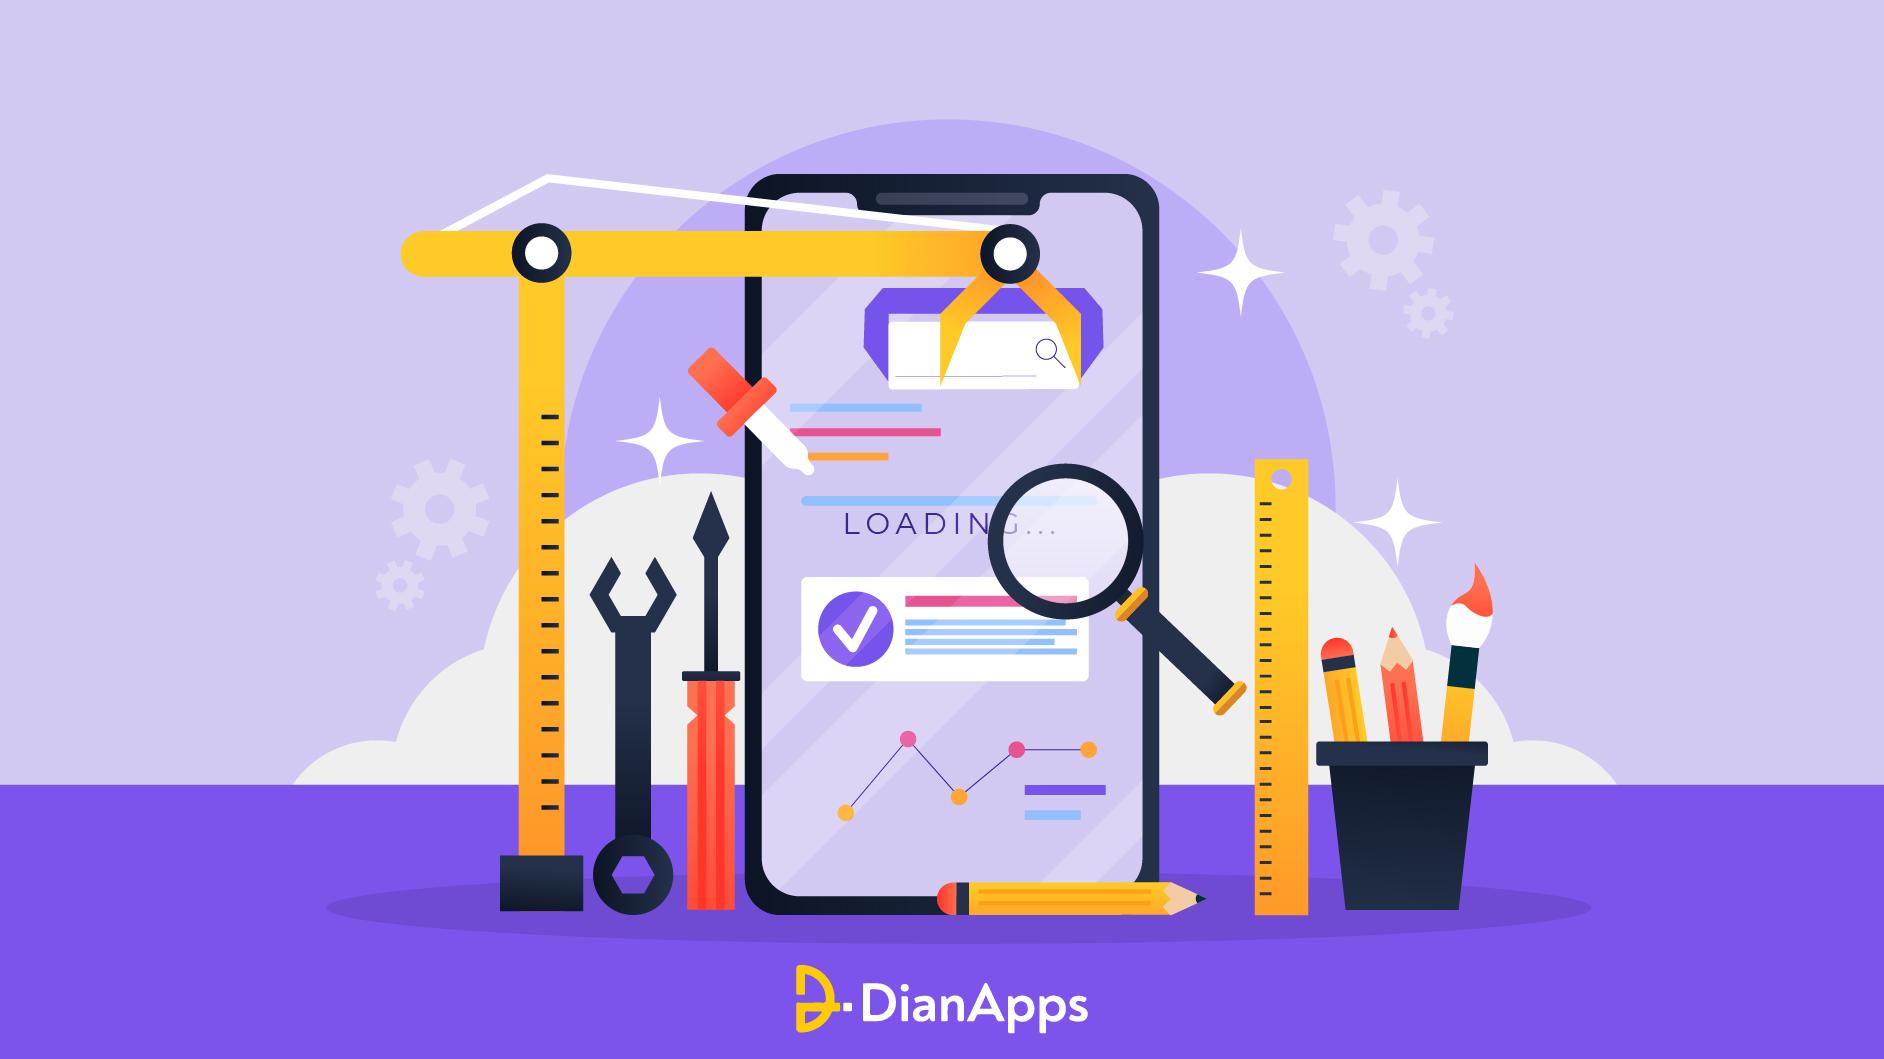 2020 Trends & Future of Mobile App Development Industry